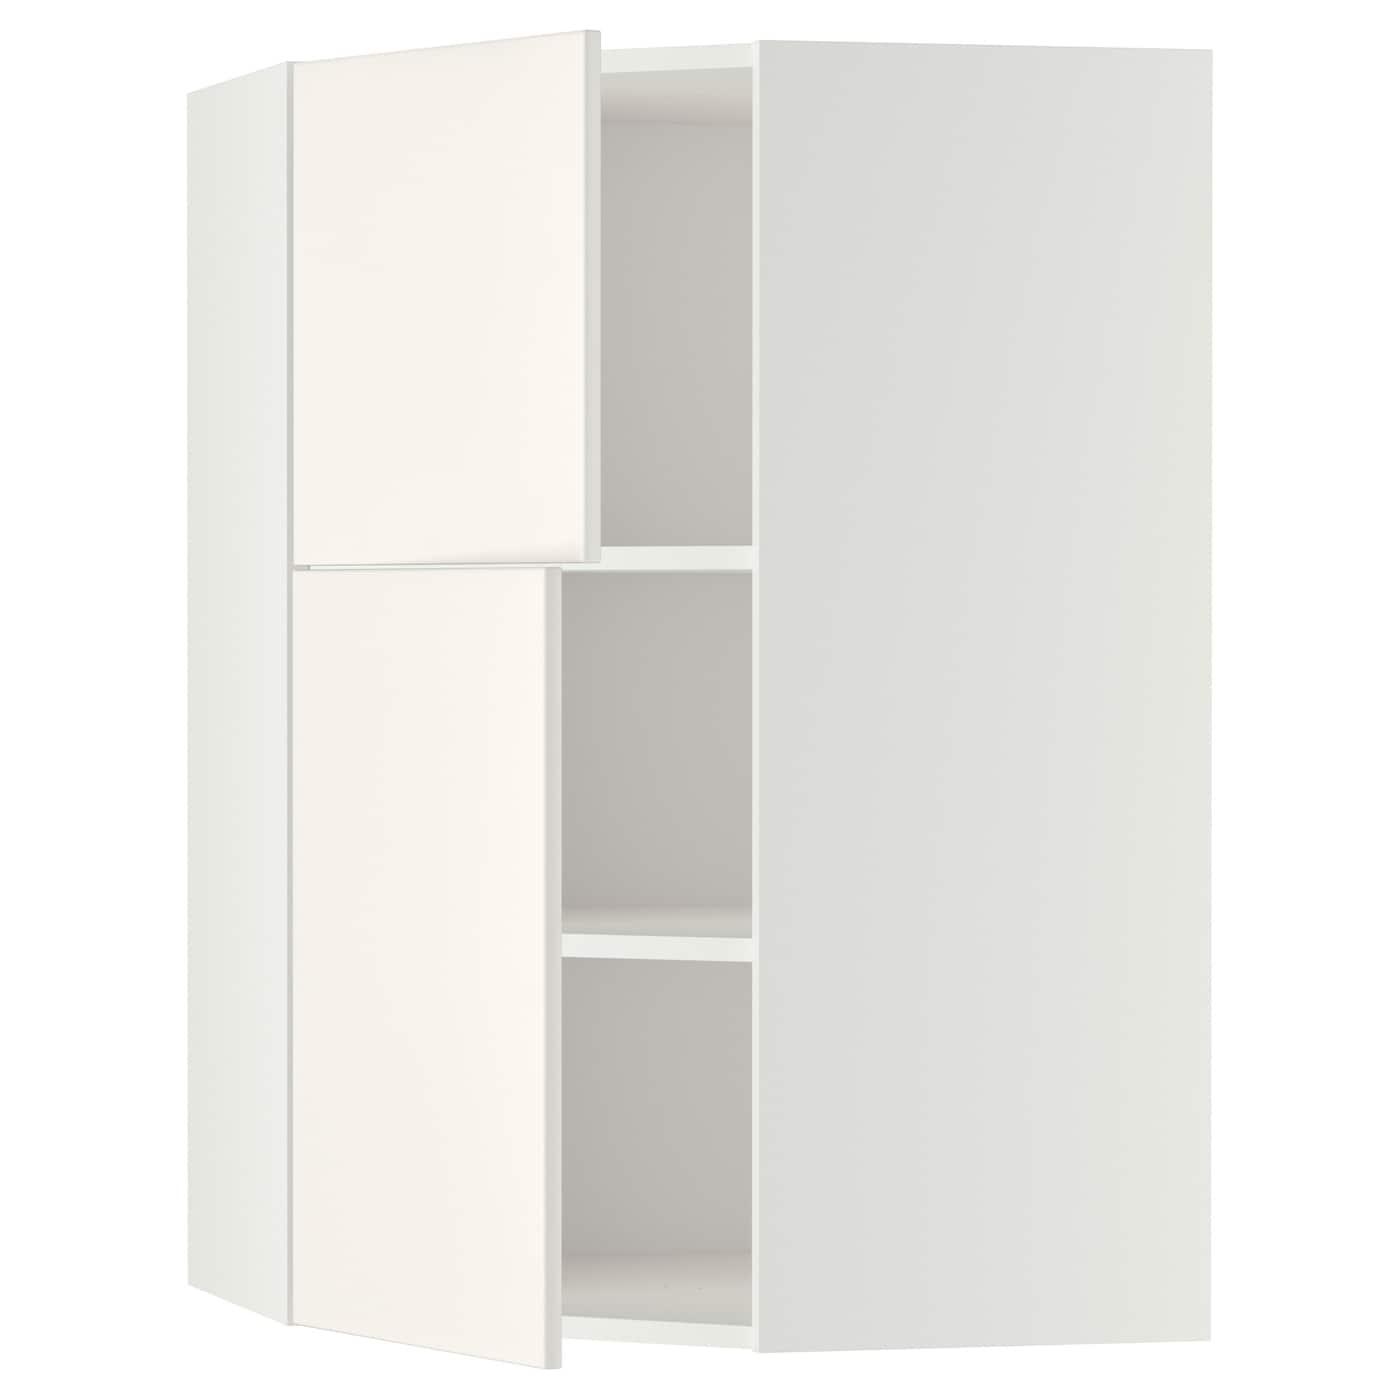 METOD Korpus Wandeckschrank - weiß, 68x68x80 cm - IKEA